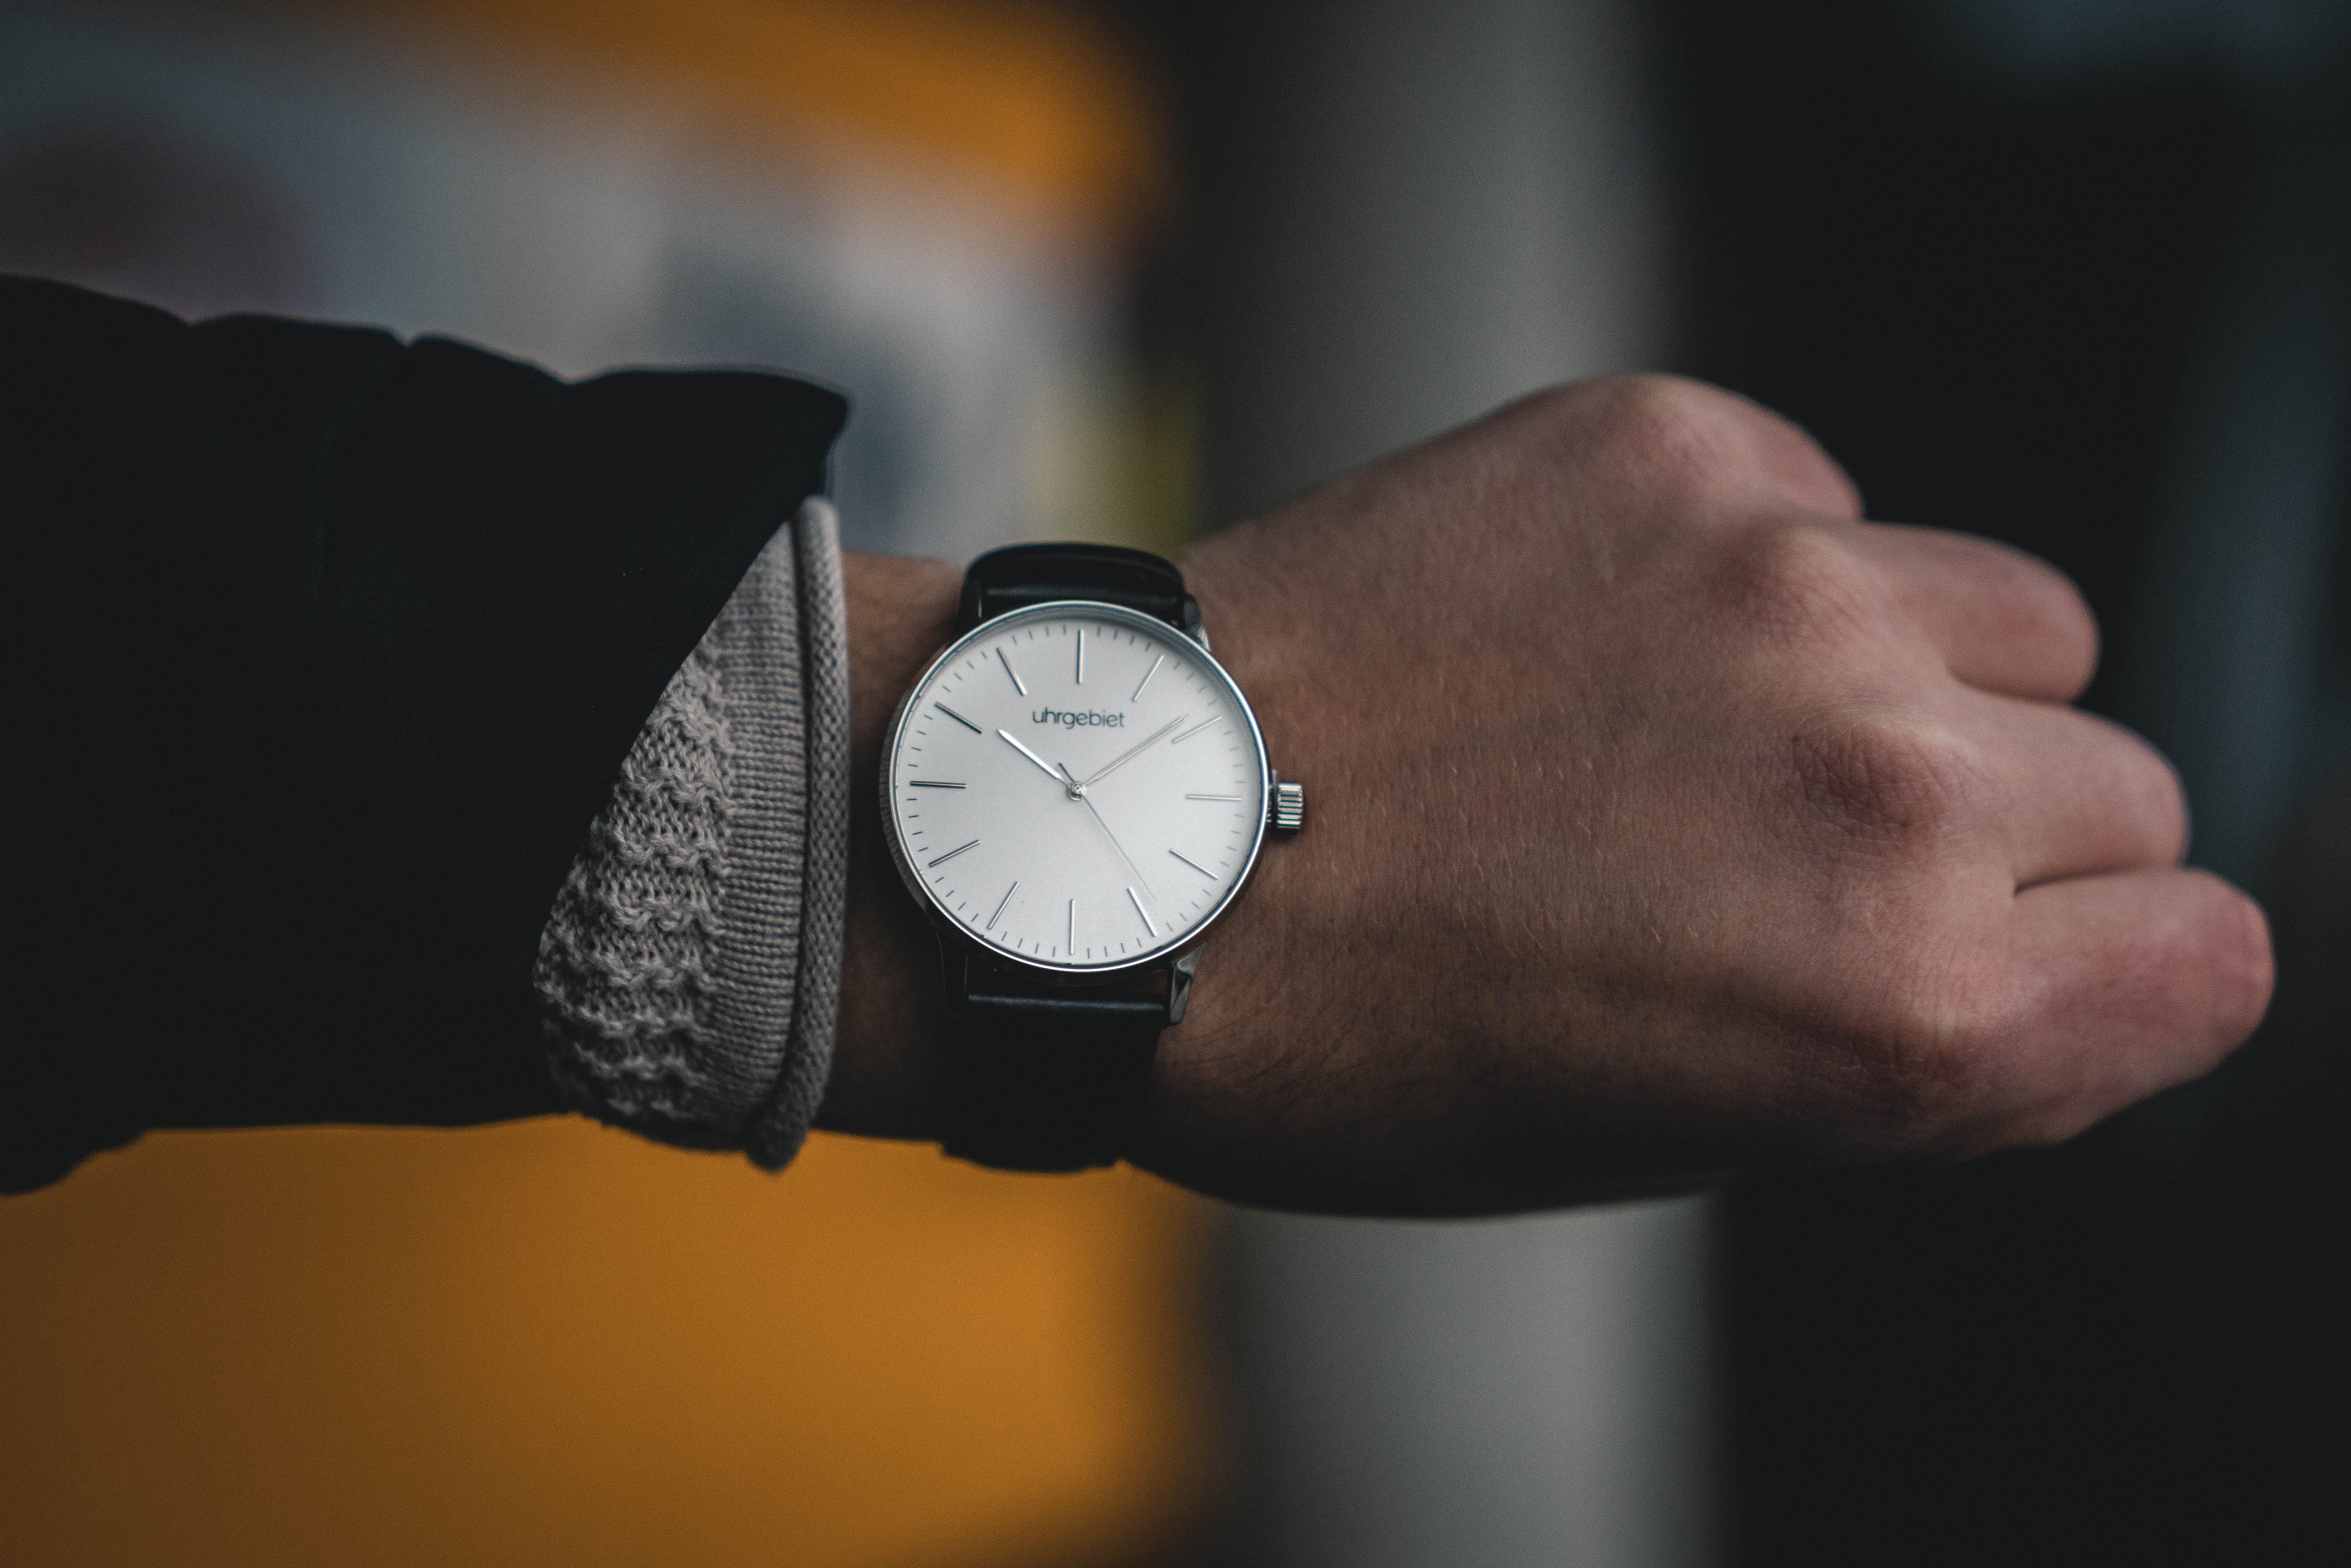 Person Wearing Round White Analog Watch at 10:09